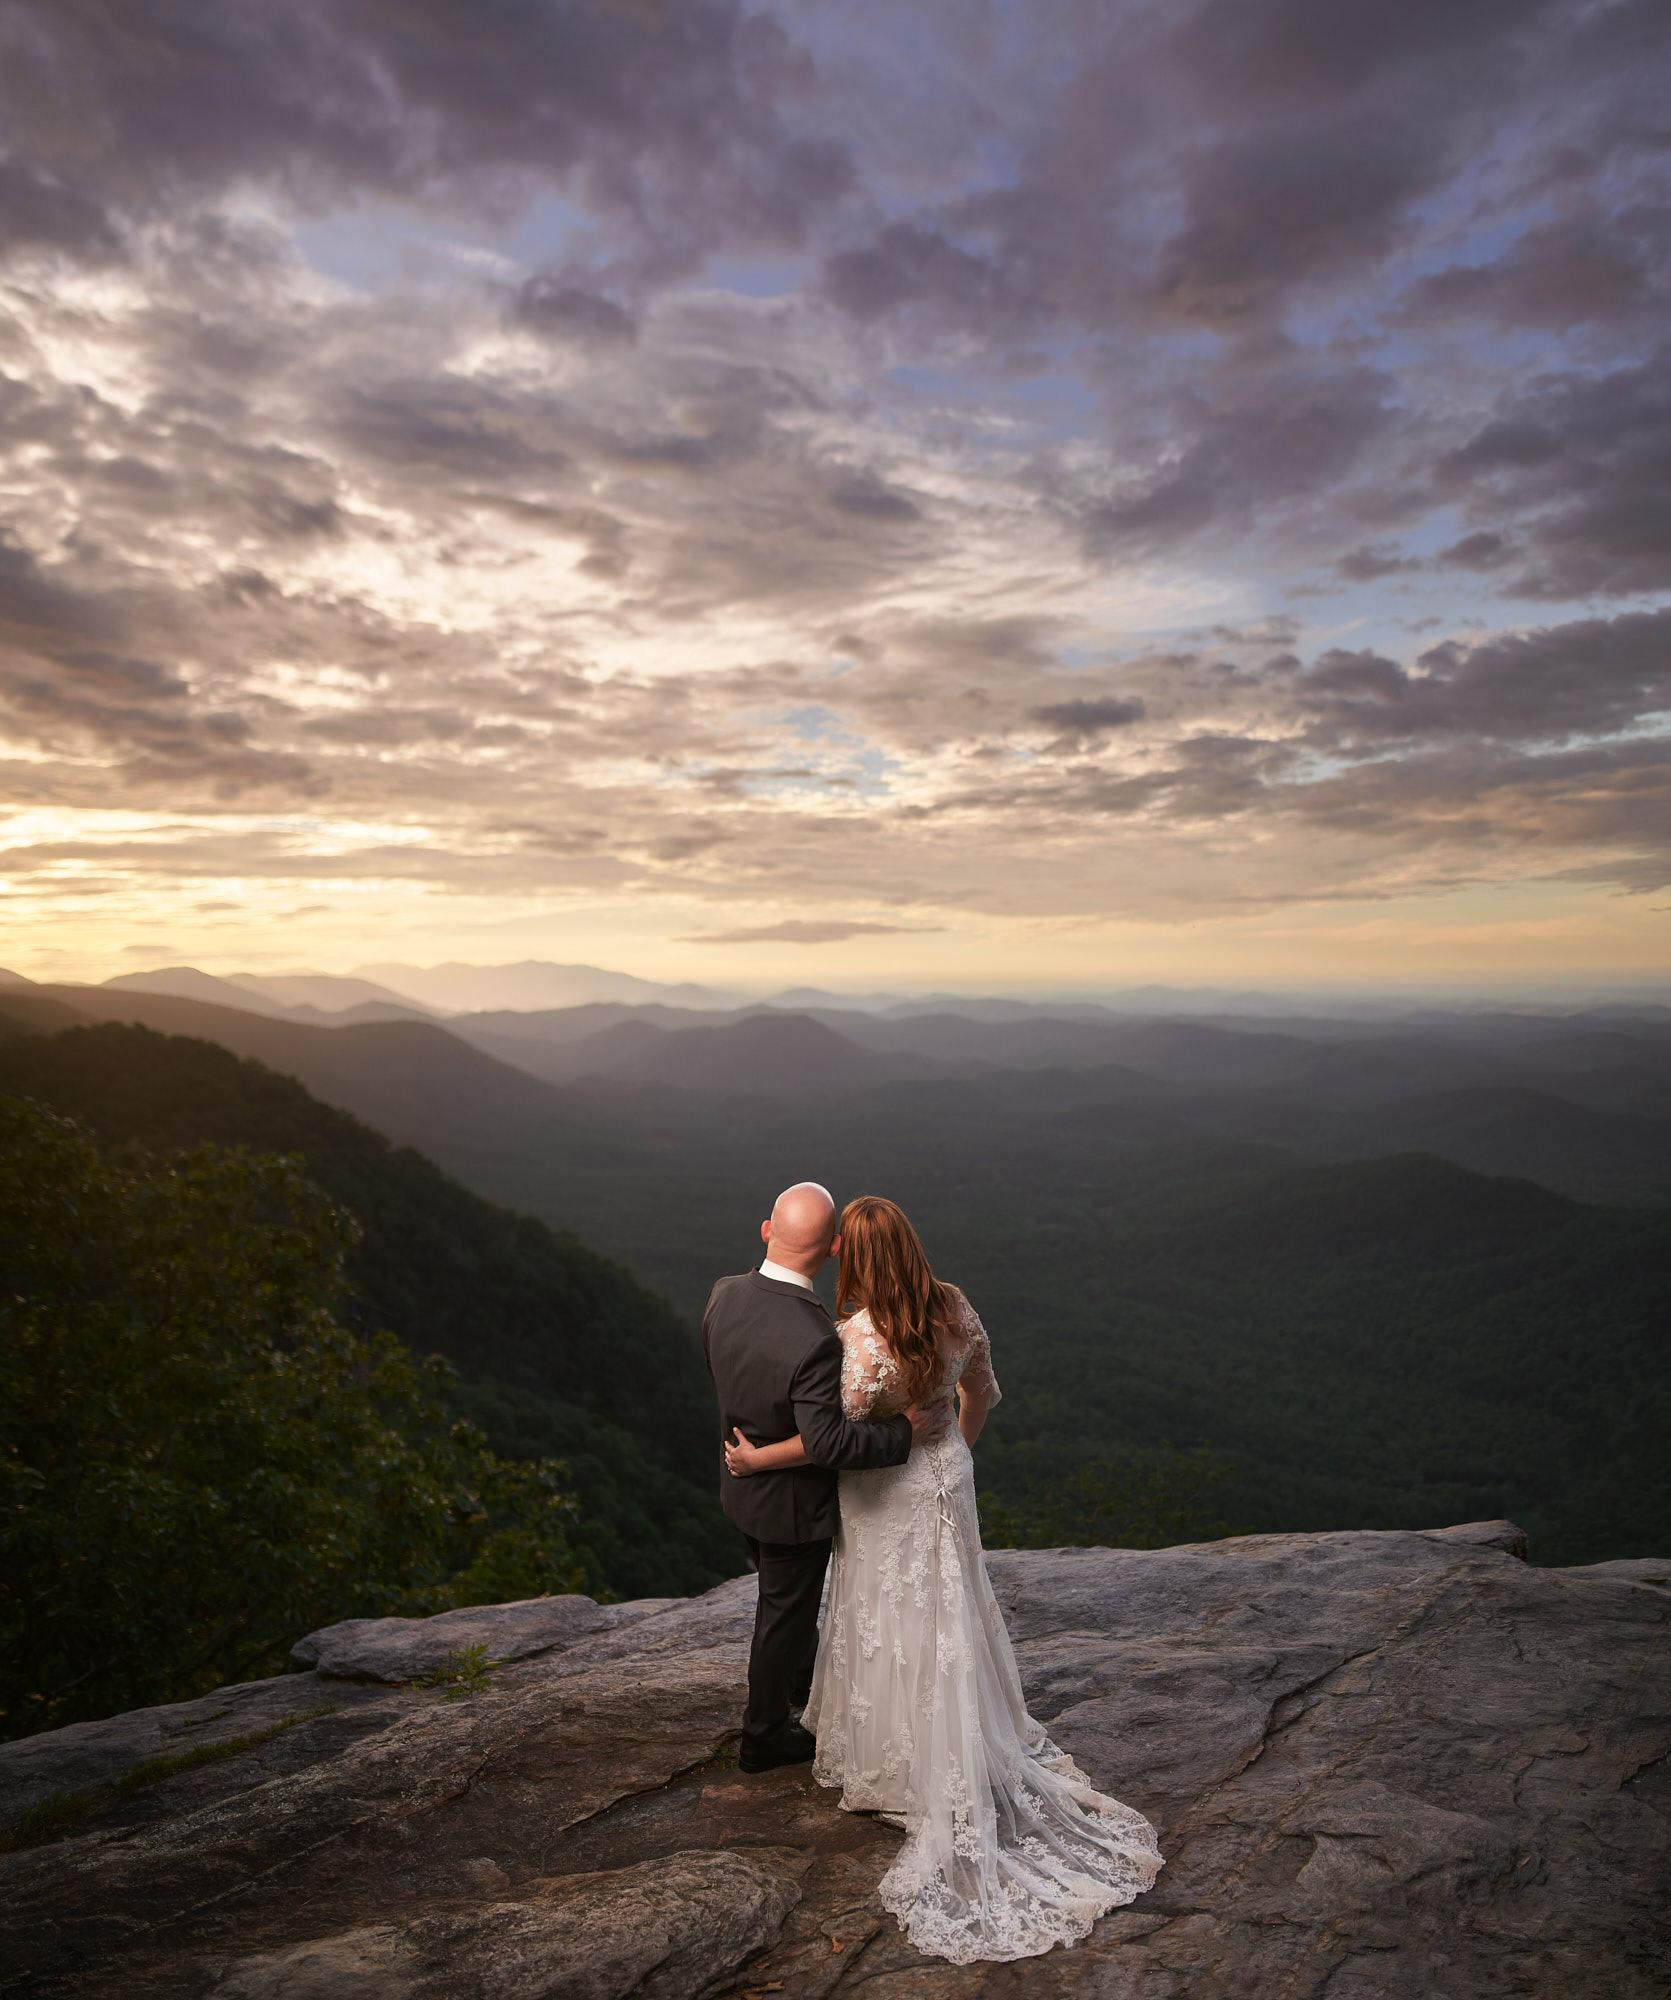 Tissiana And John's Sunrise Wedding At Pretty Place Chapel